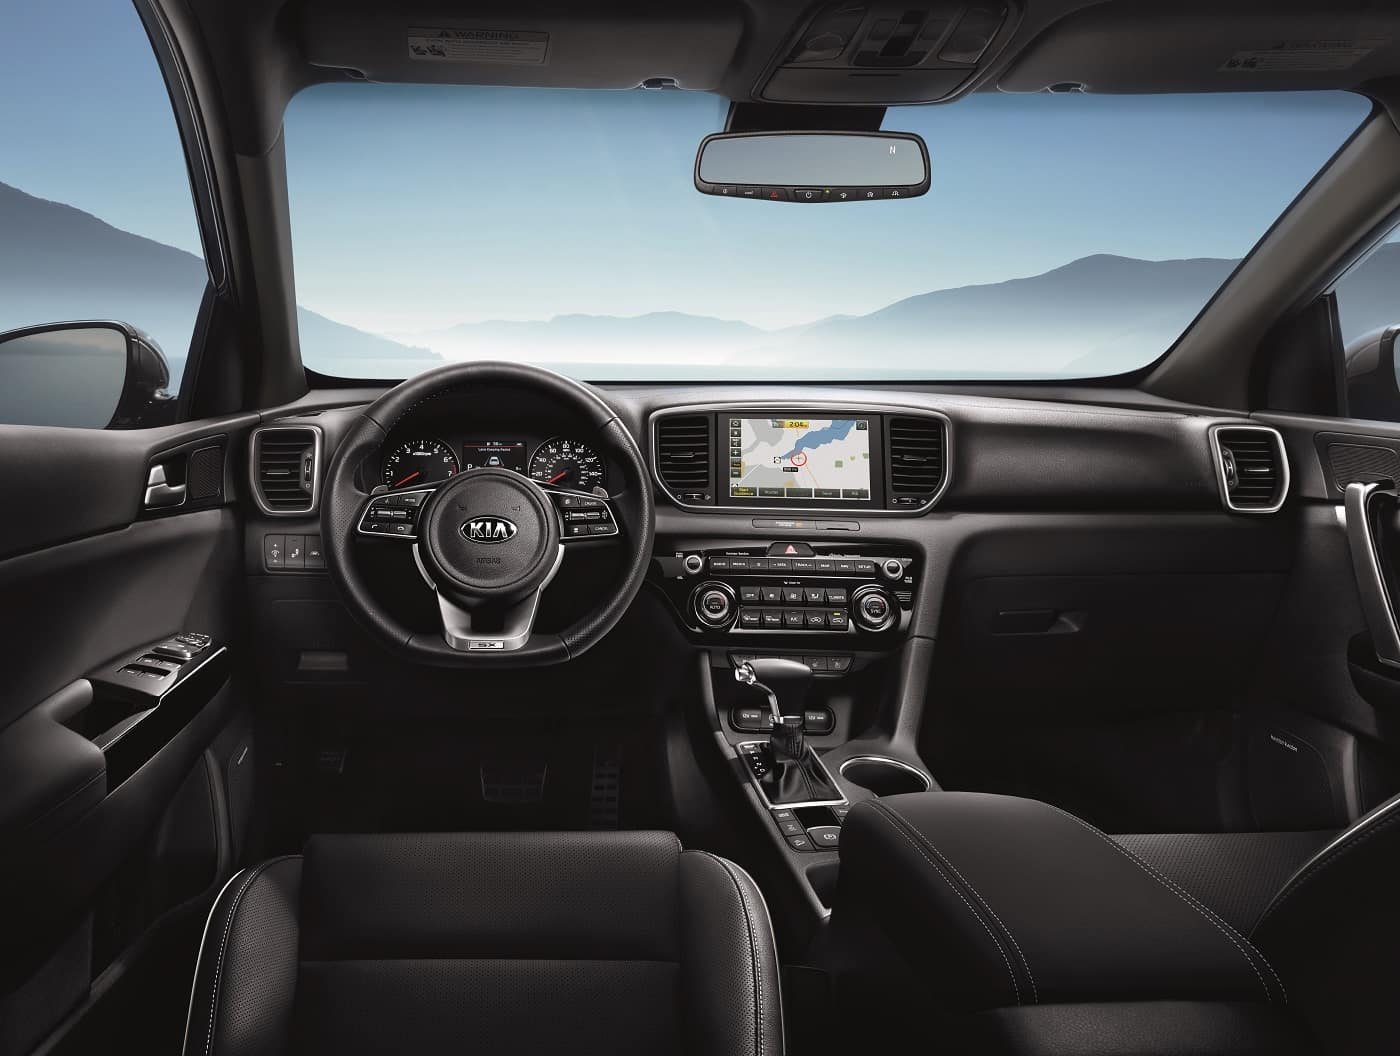 2020 Kia Interior Technology